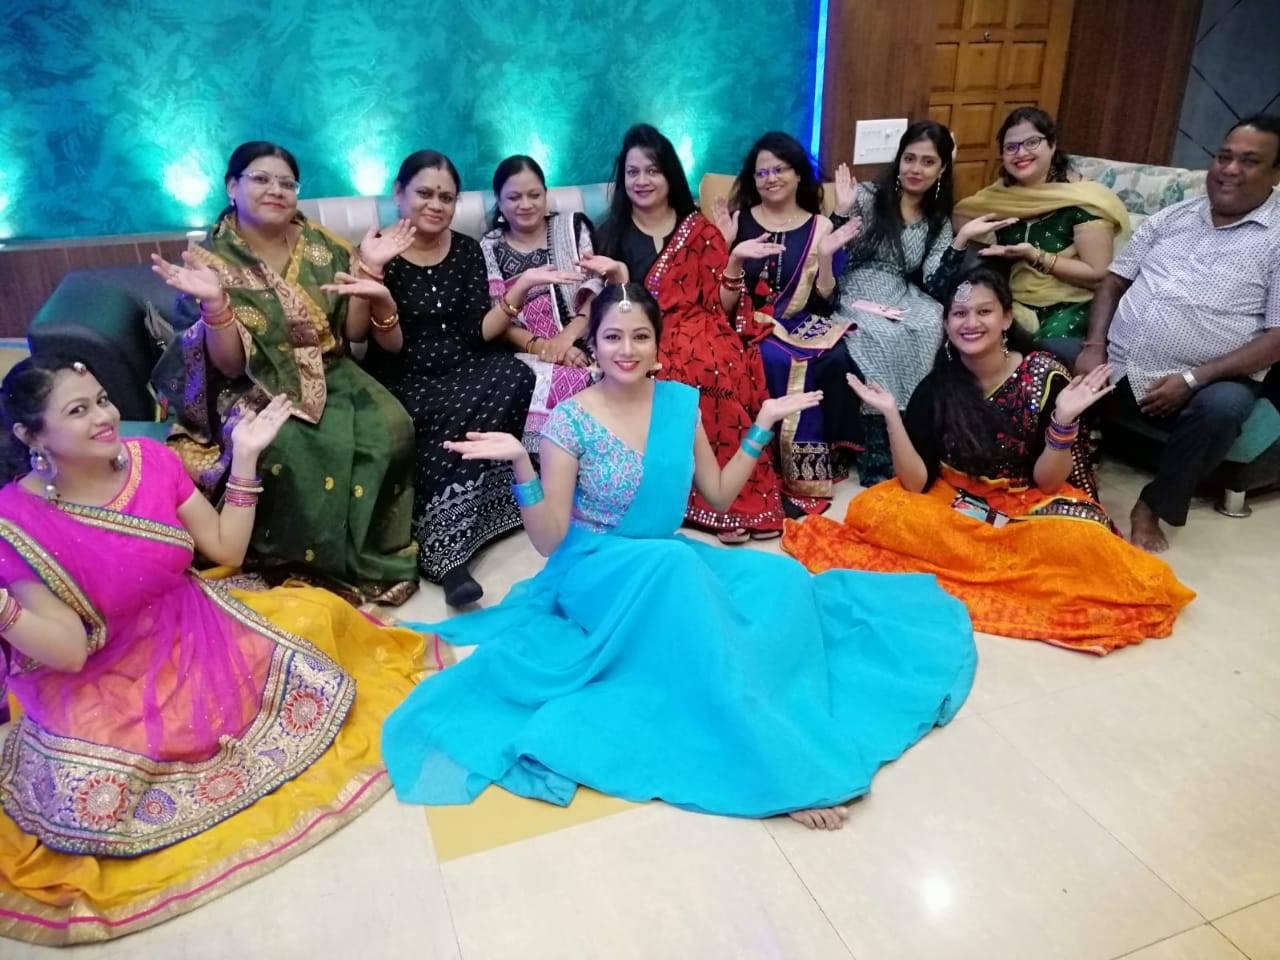 Archita family celebrating Kumar Purnima.